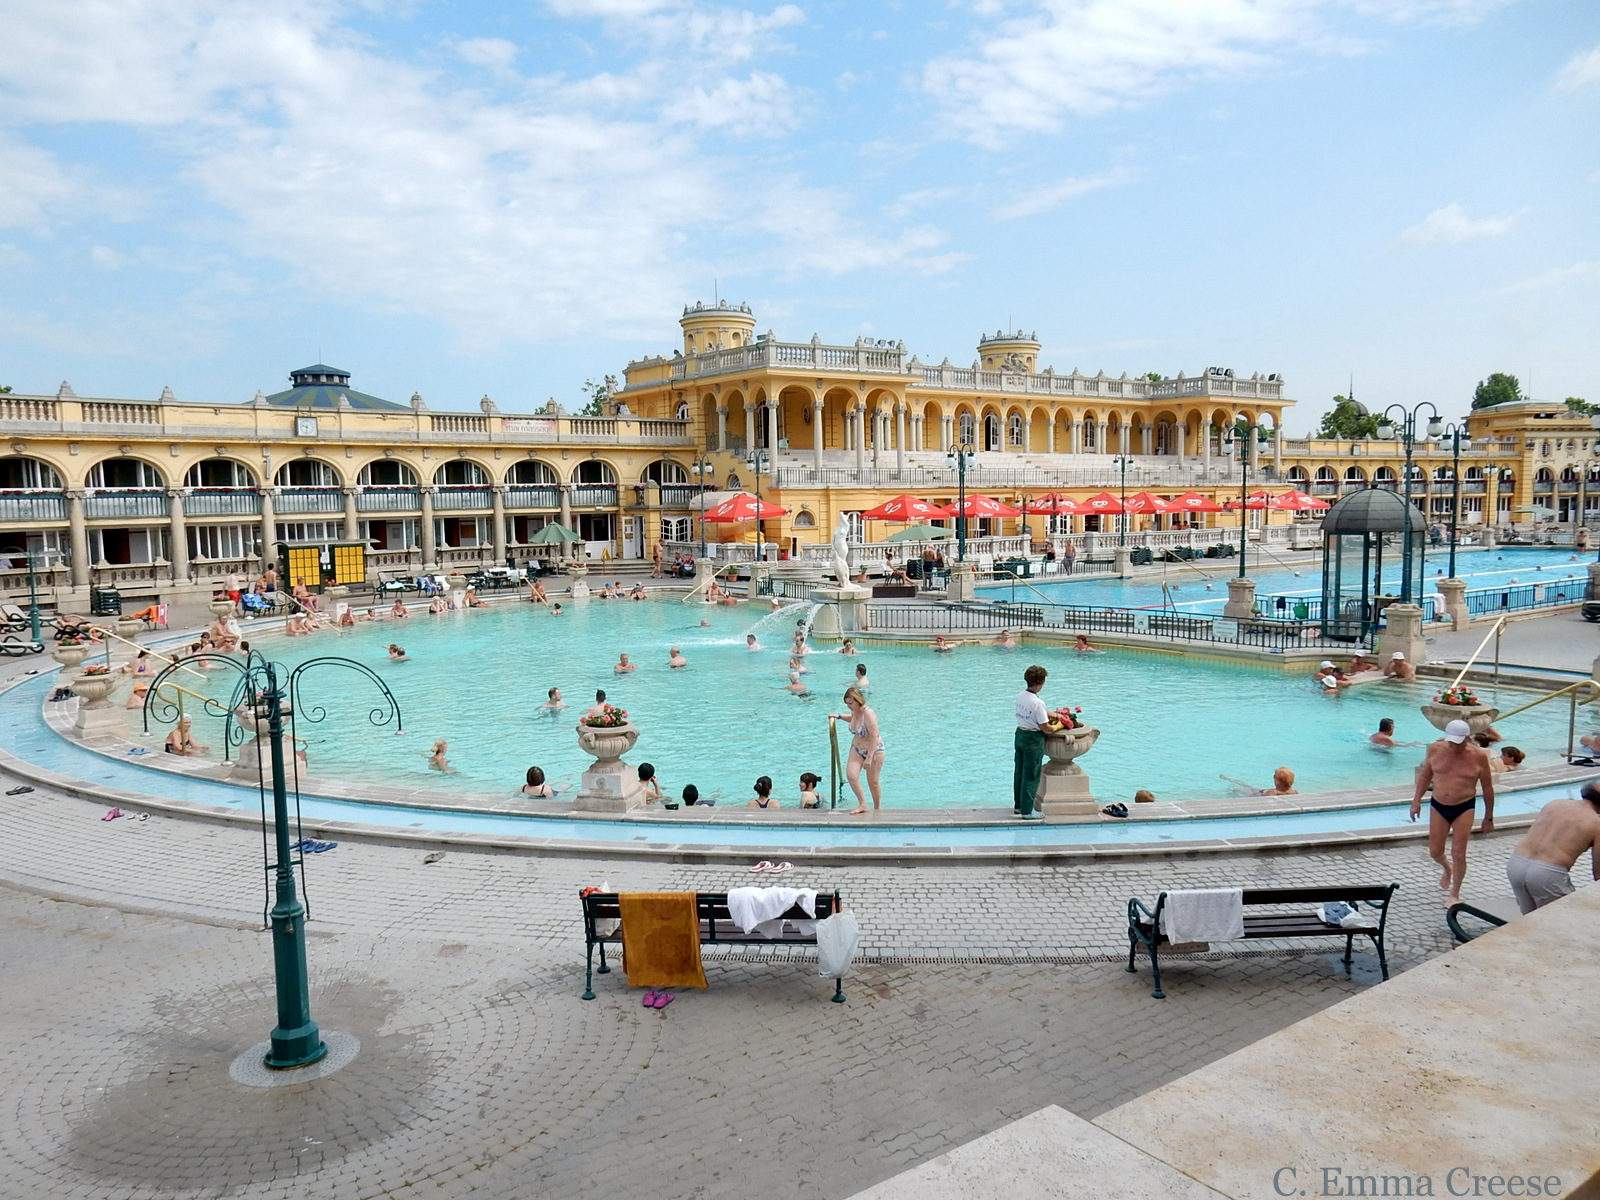 Szechenyi Baths 10 reasons luxury city break Budapest Hungary Adventures of a London Kiwi